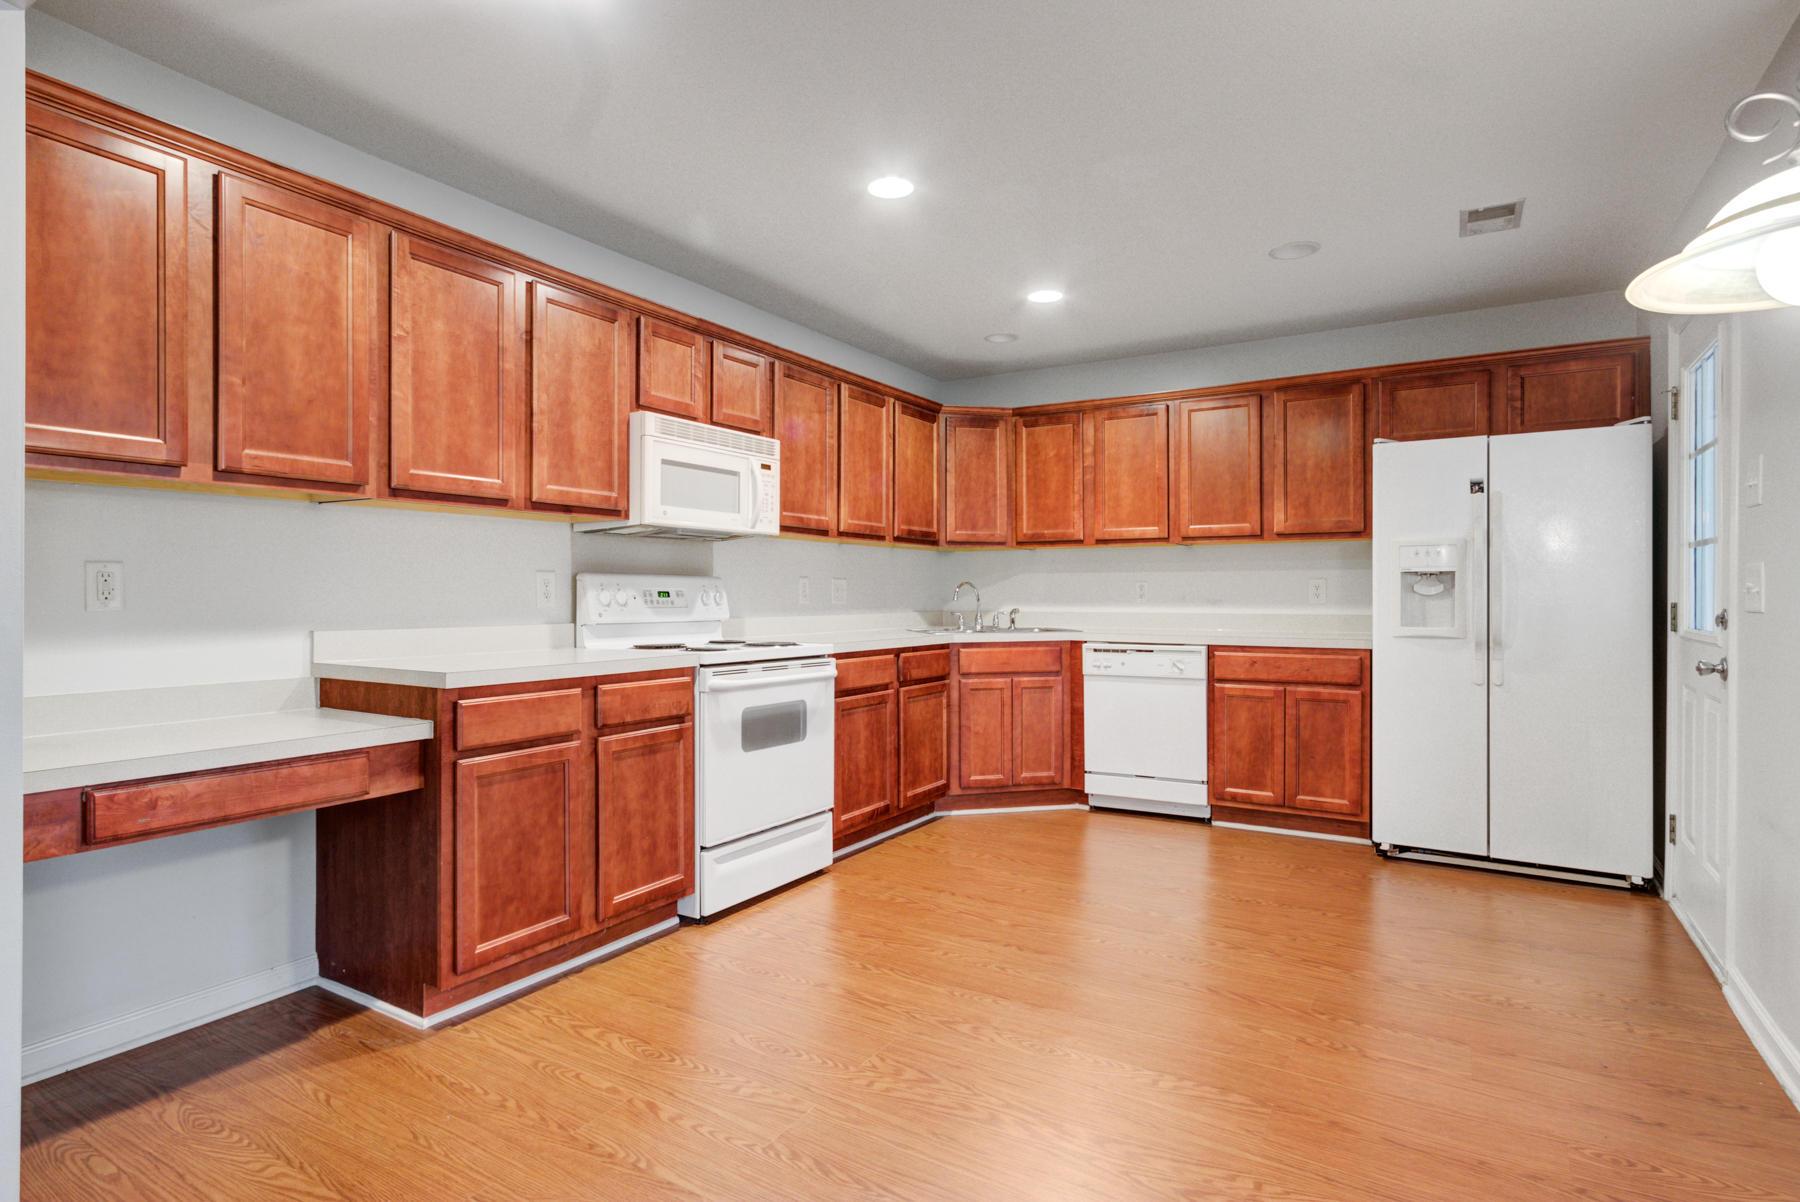 Grand Oaks Plantation Homes For Sale - 564 Hainesworth, Charleston, SC - 9